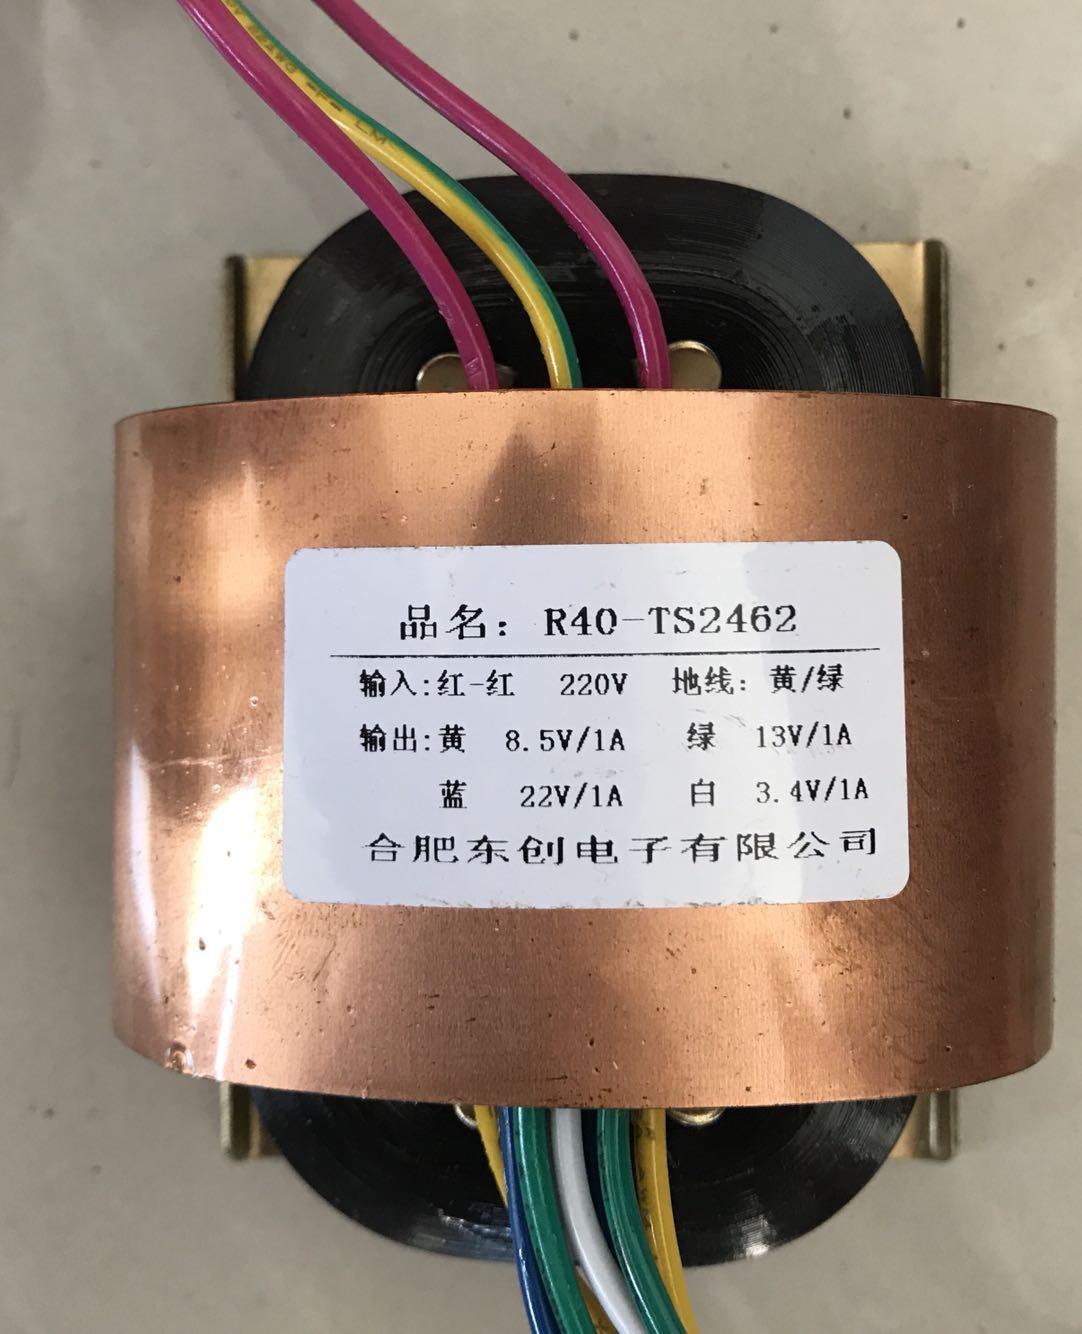 8.5V 1A 22V 1A 13V 1A 3.4V R Core Transformer 45VA R40 custom transformer 220V copper shield output for Power supply amplifier 16v 0 16v 1a 2 9v 1a r core transformer 50va r40 custom transformer 110v 110v copper shield output for power supply amplifier